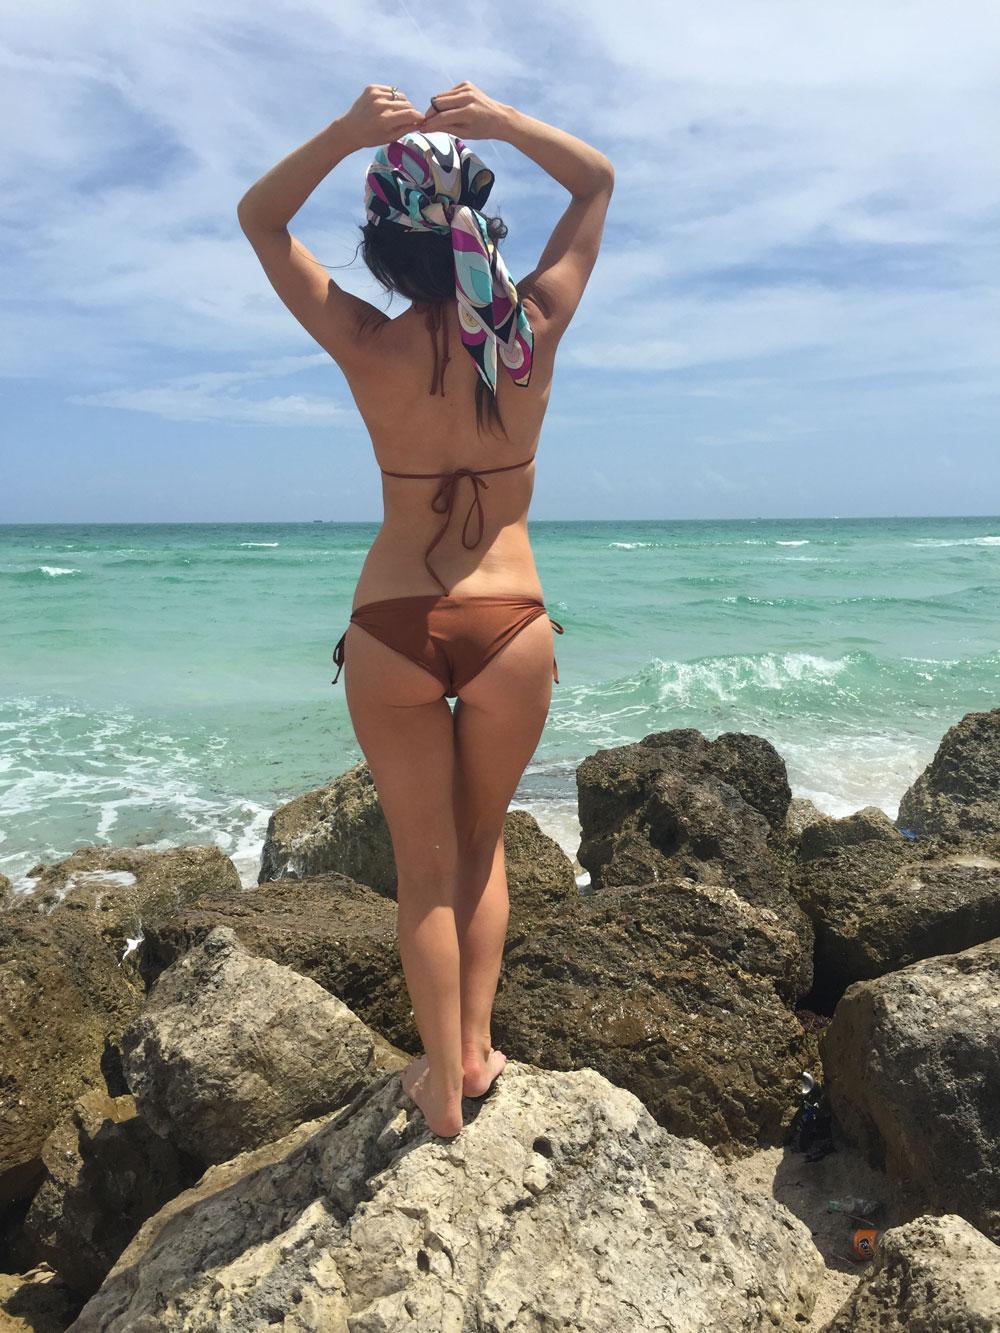 digging Miami!